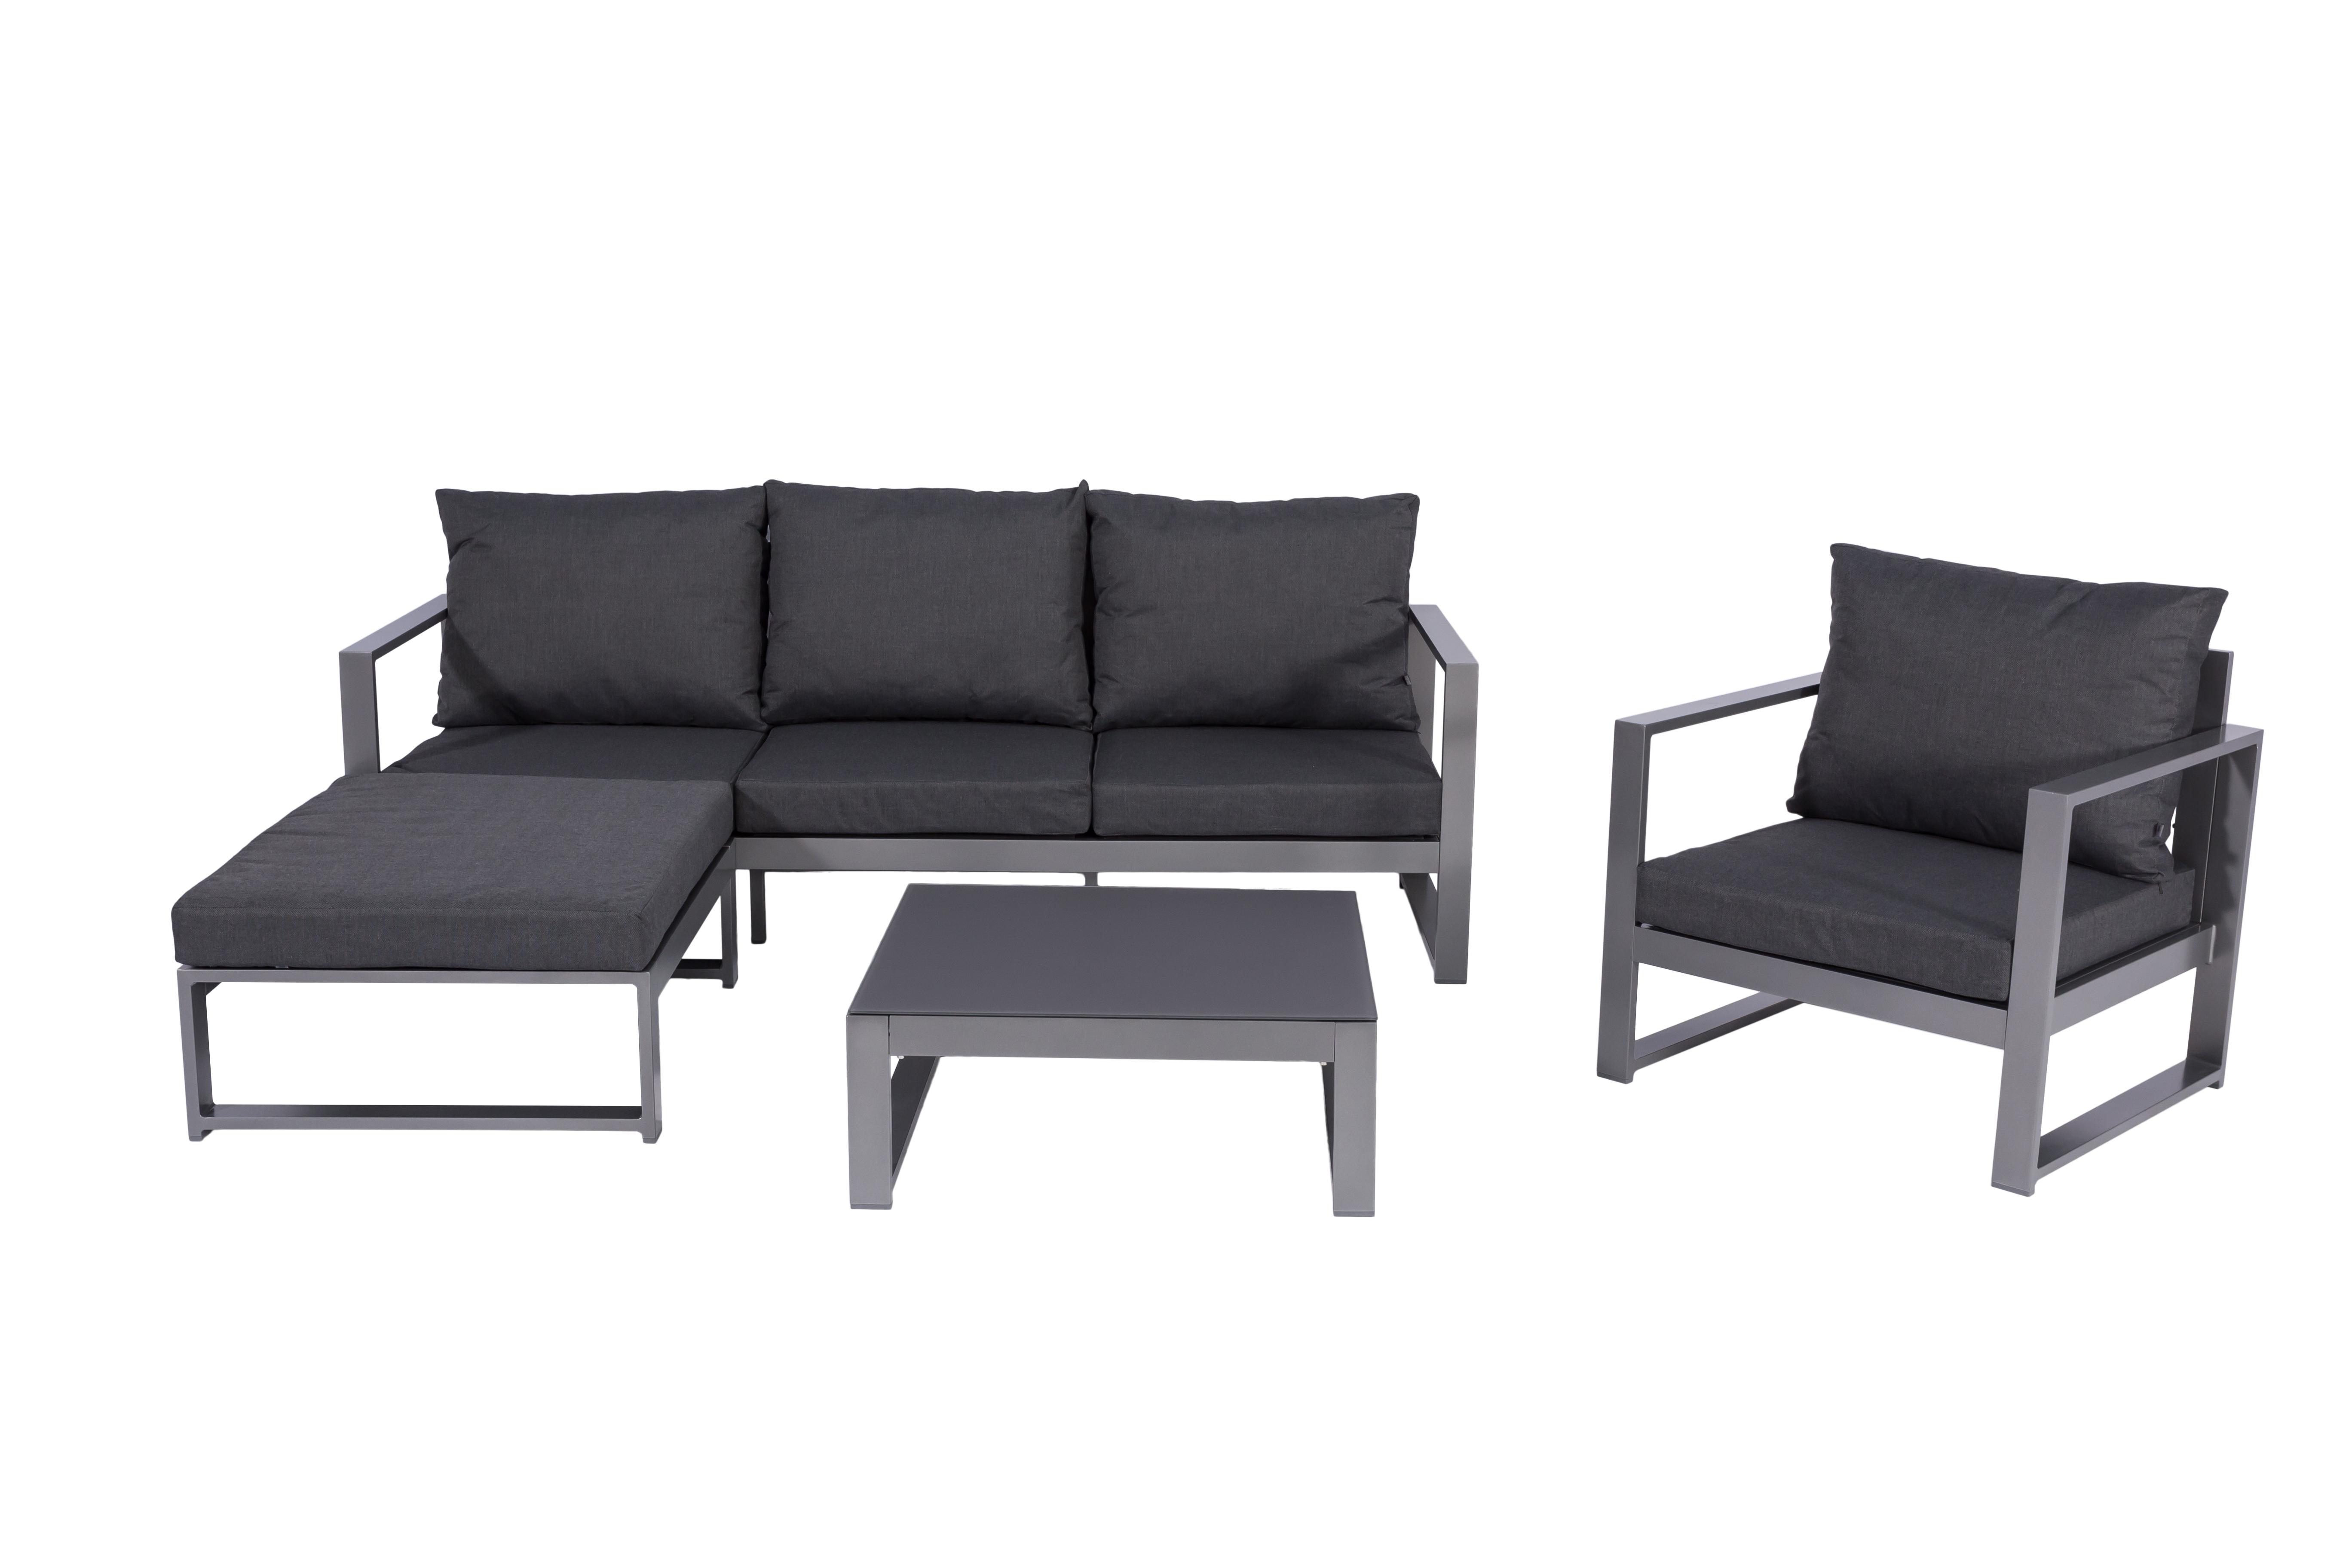 bella aluminium ecklounge gartenm bel sitzgruppe anthrazit lounge m bel garten. Black Bedroom Furniture Sets. Home Design Ideas